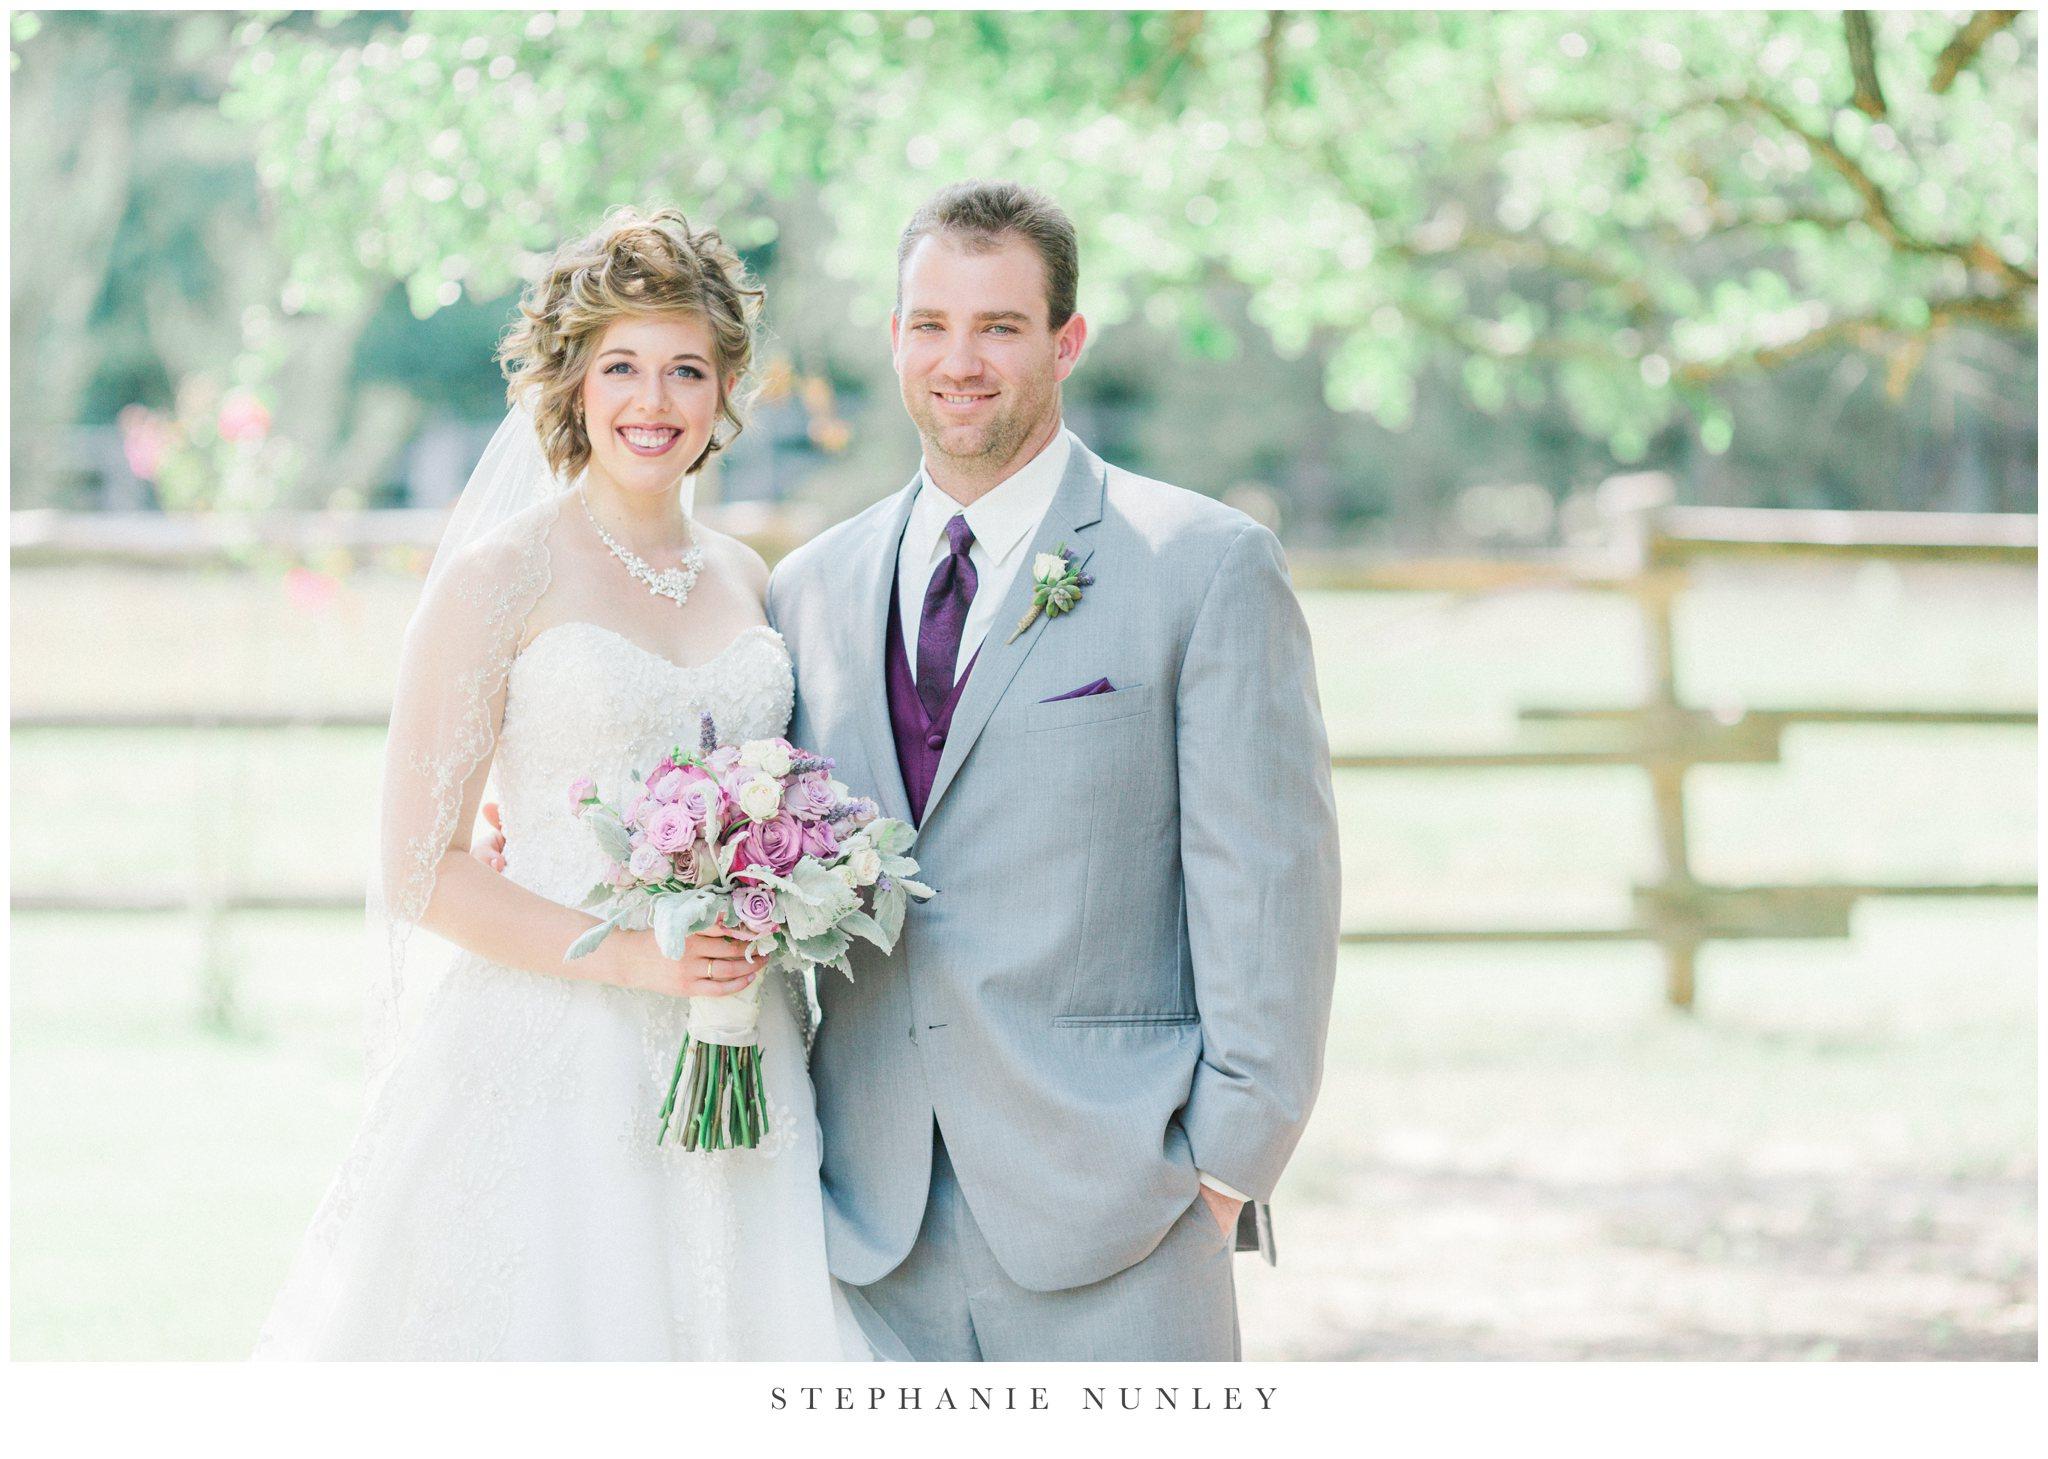 southern-classy-outdoor-barn-wedding-photos-0034.jpg